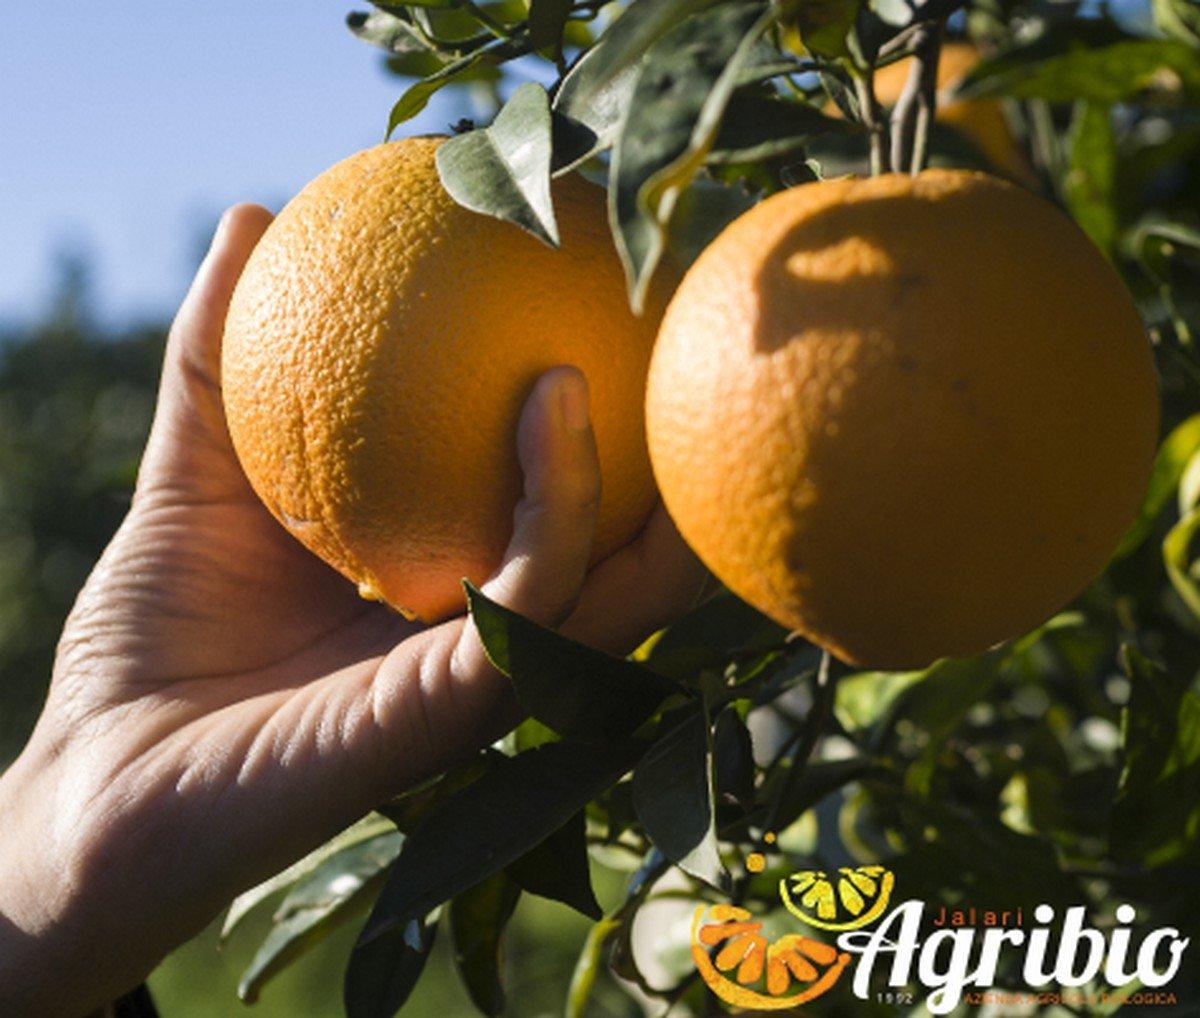 Azienda agricola biologica jalari - Agrumi biologici siciliani - arancio newhall